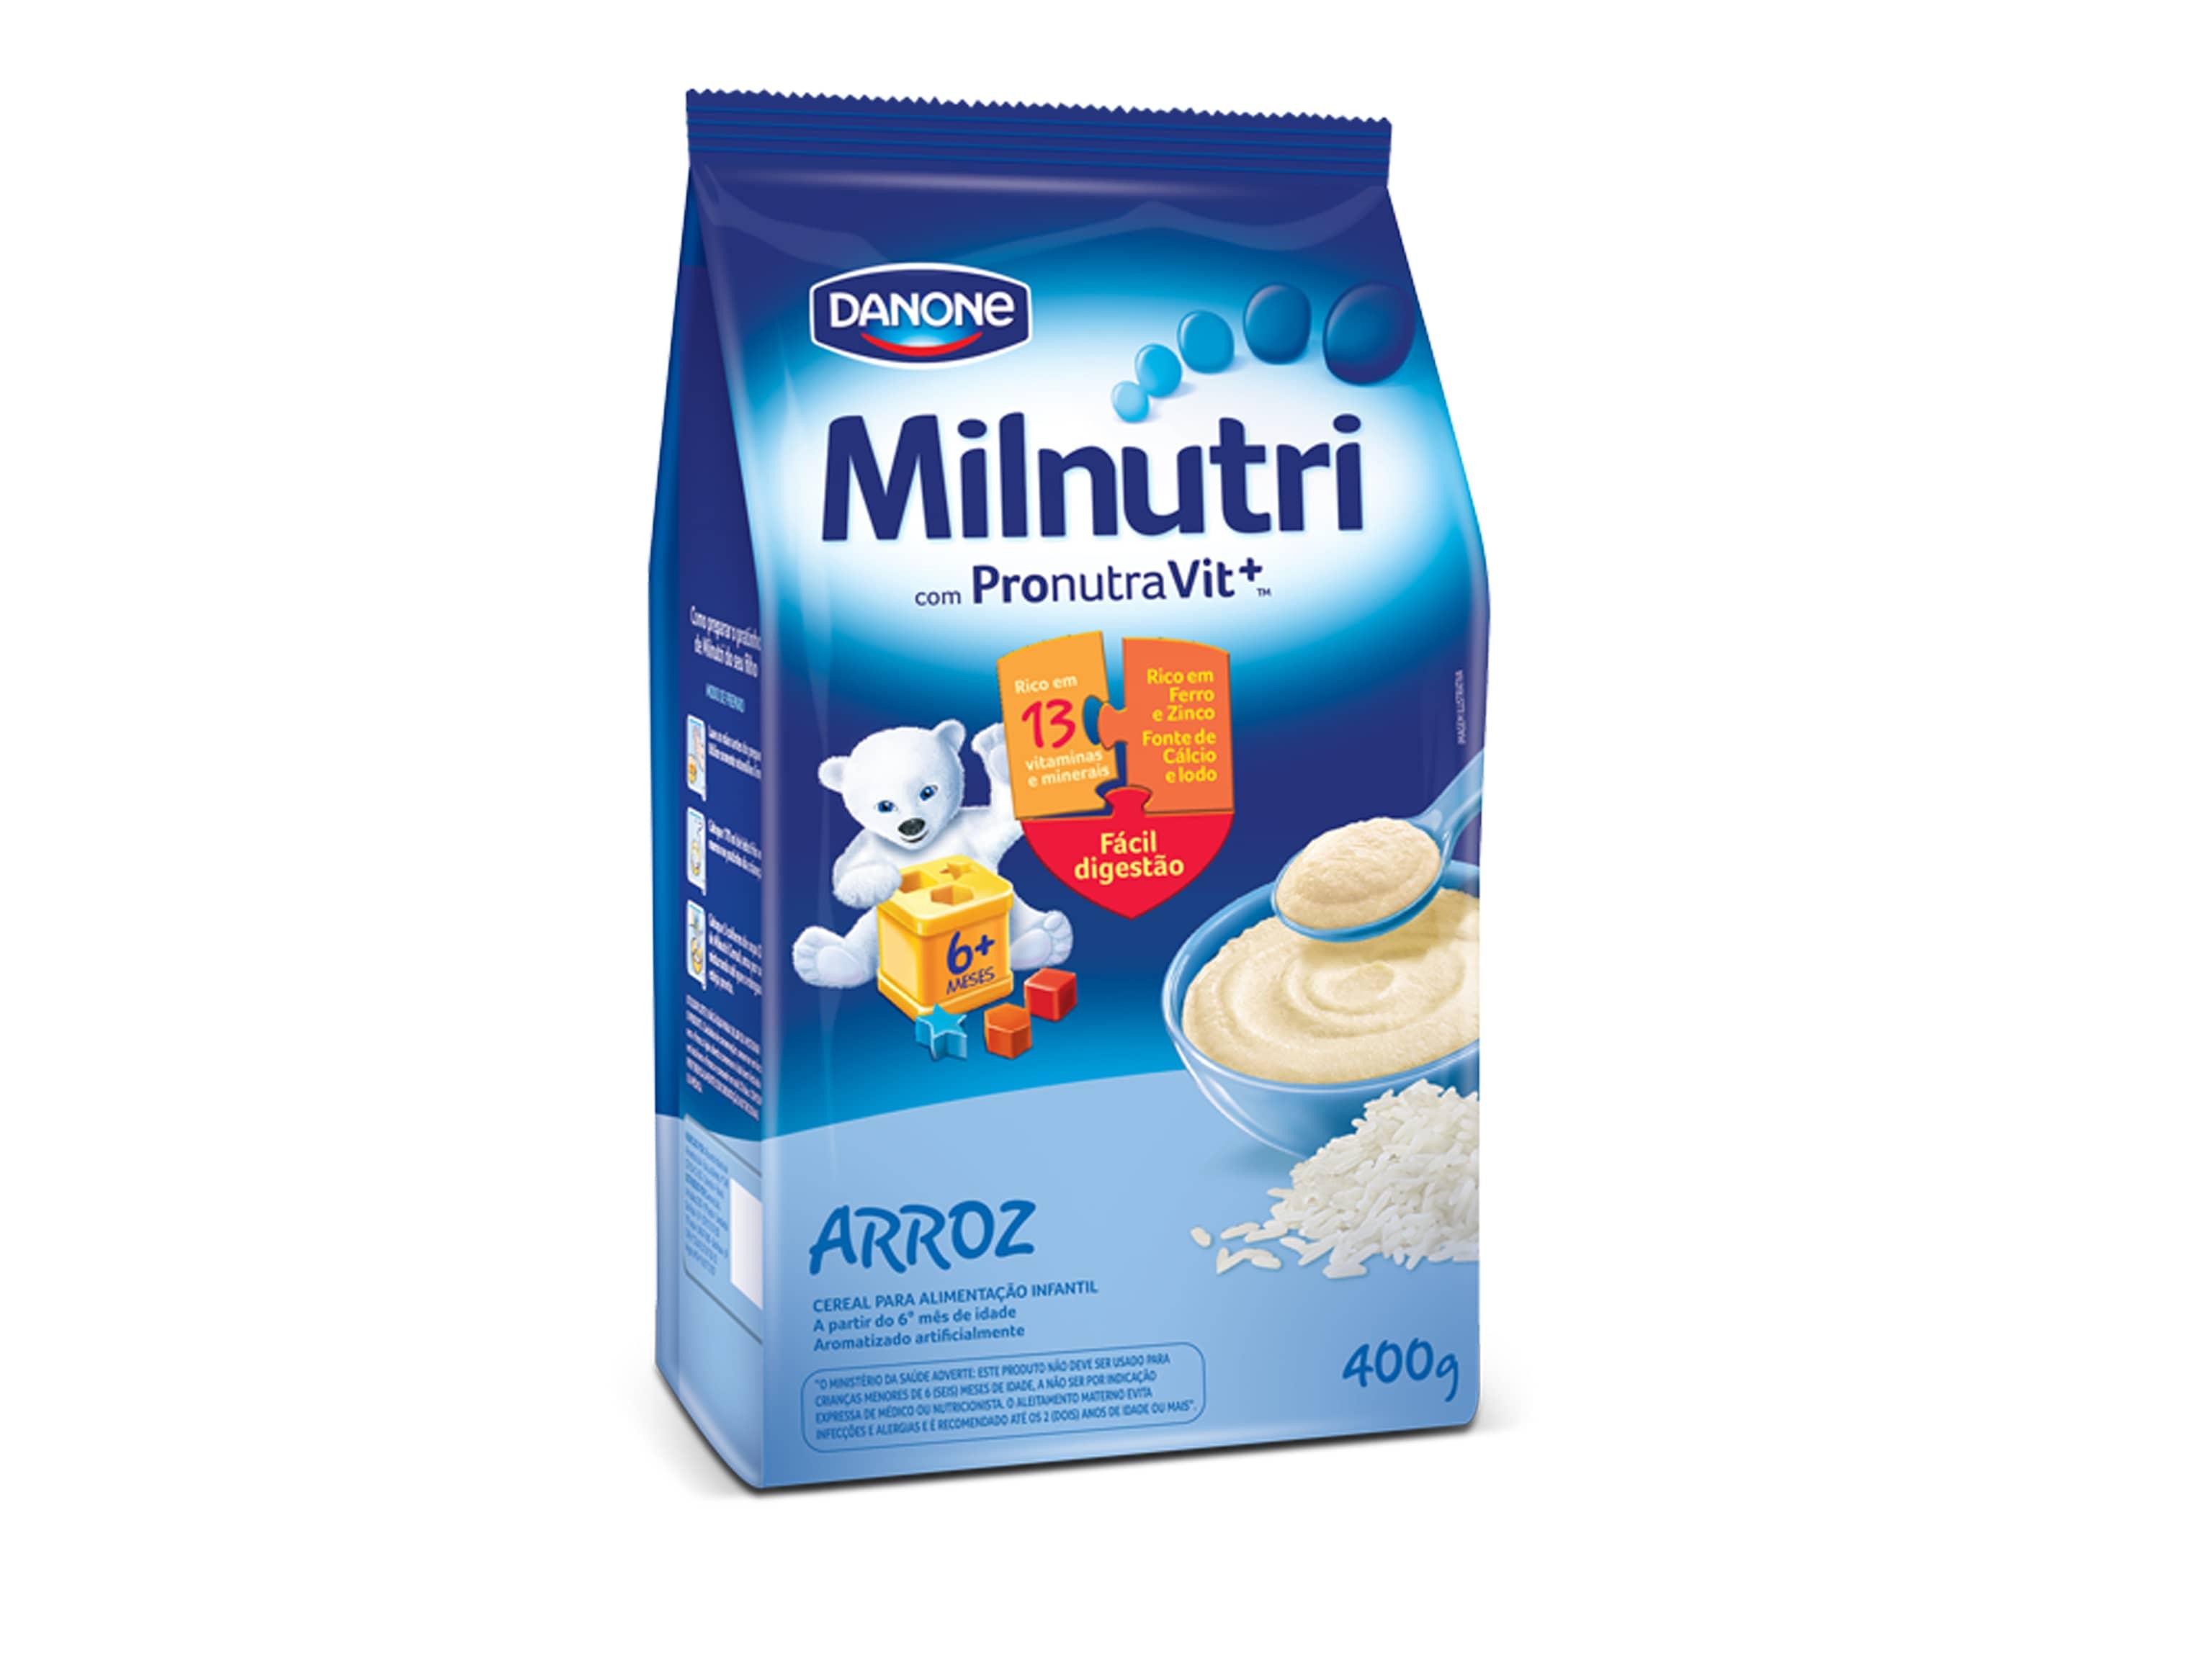 MOCKUP-MILNUTRI-ARROZ-400G